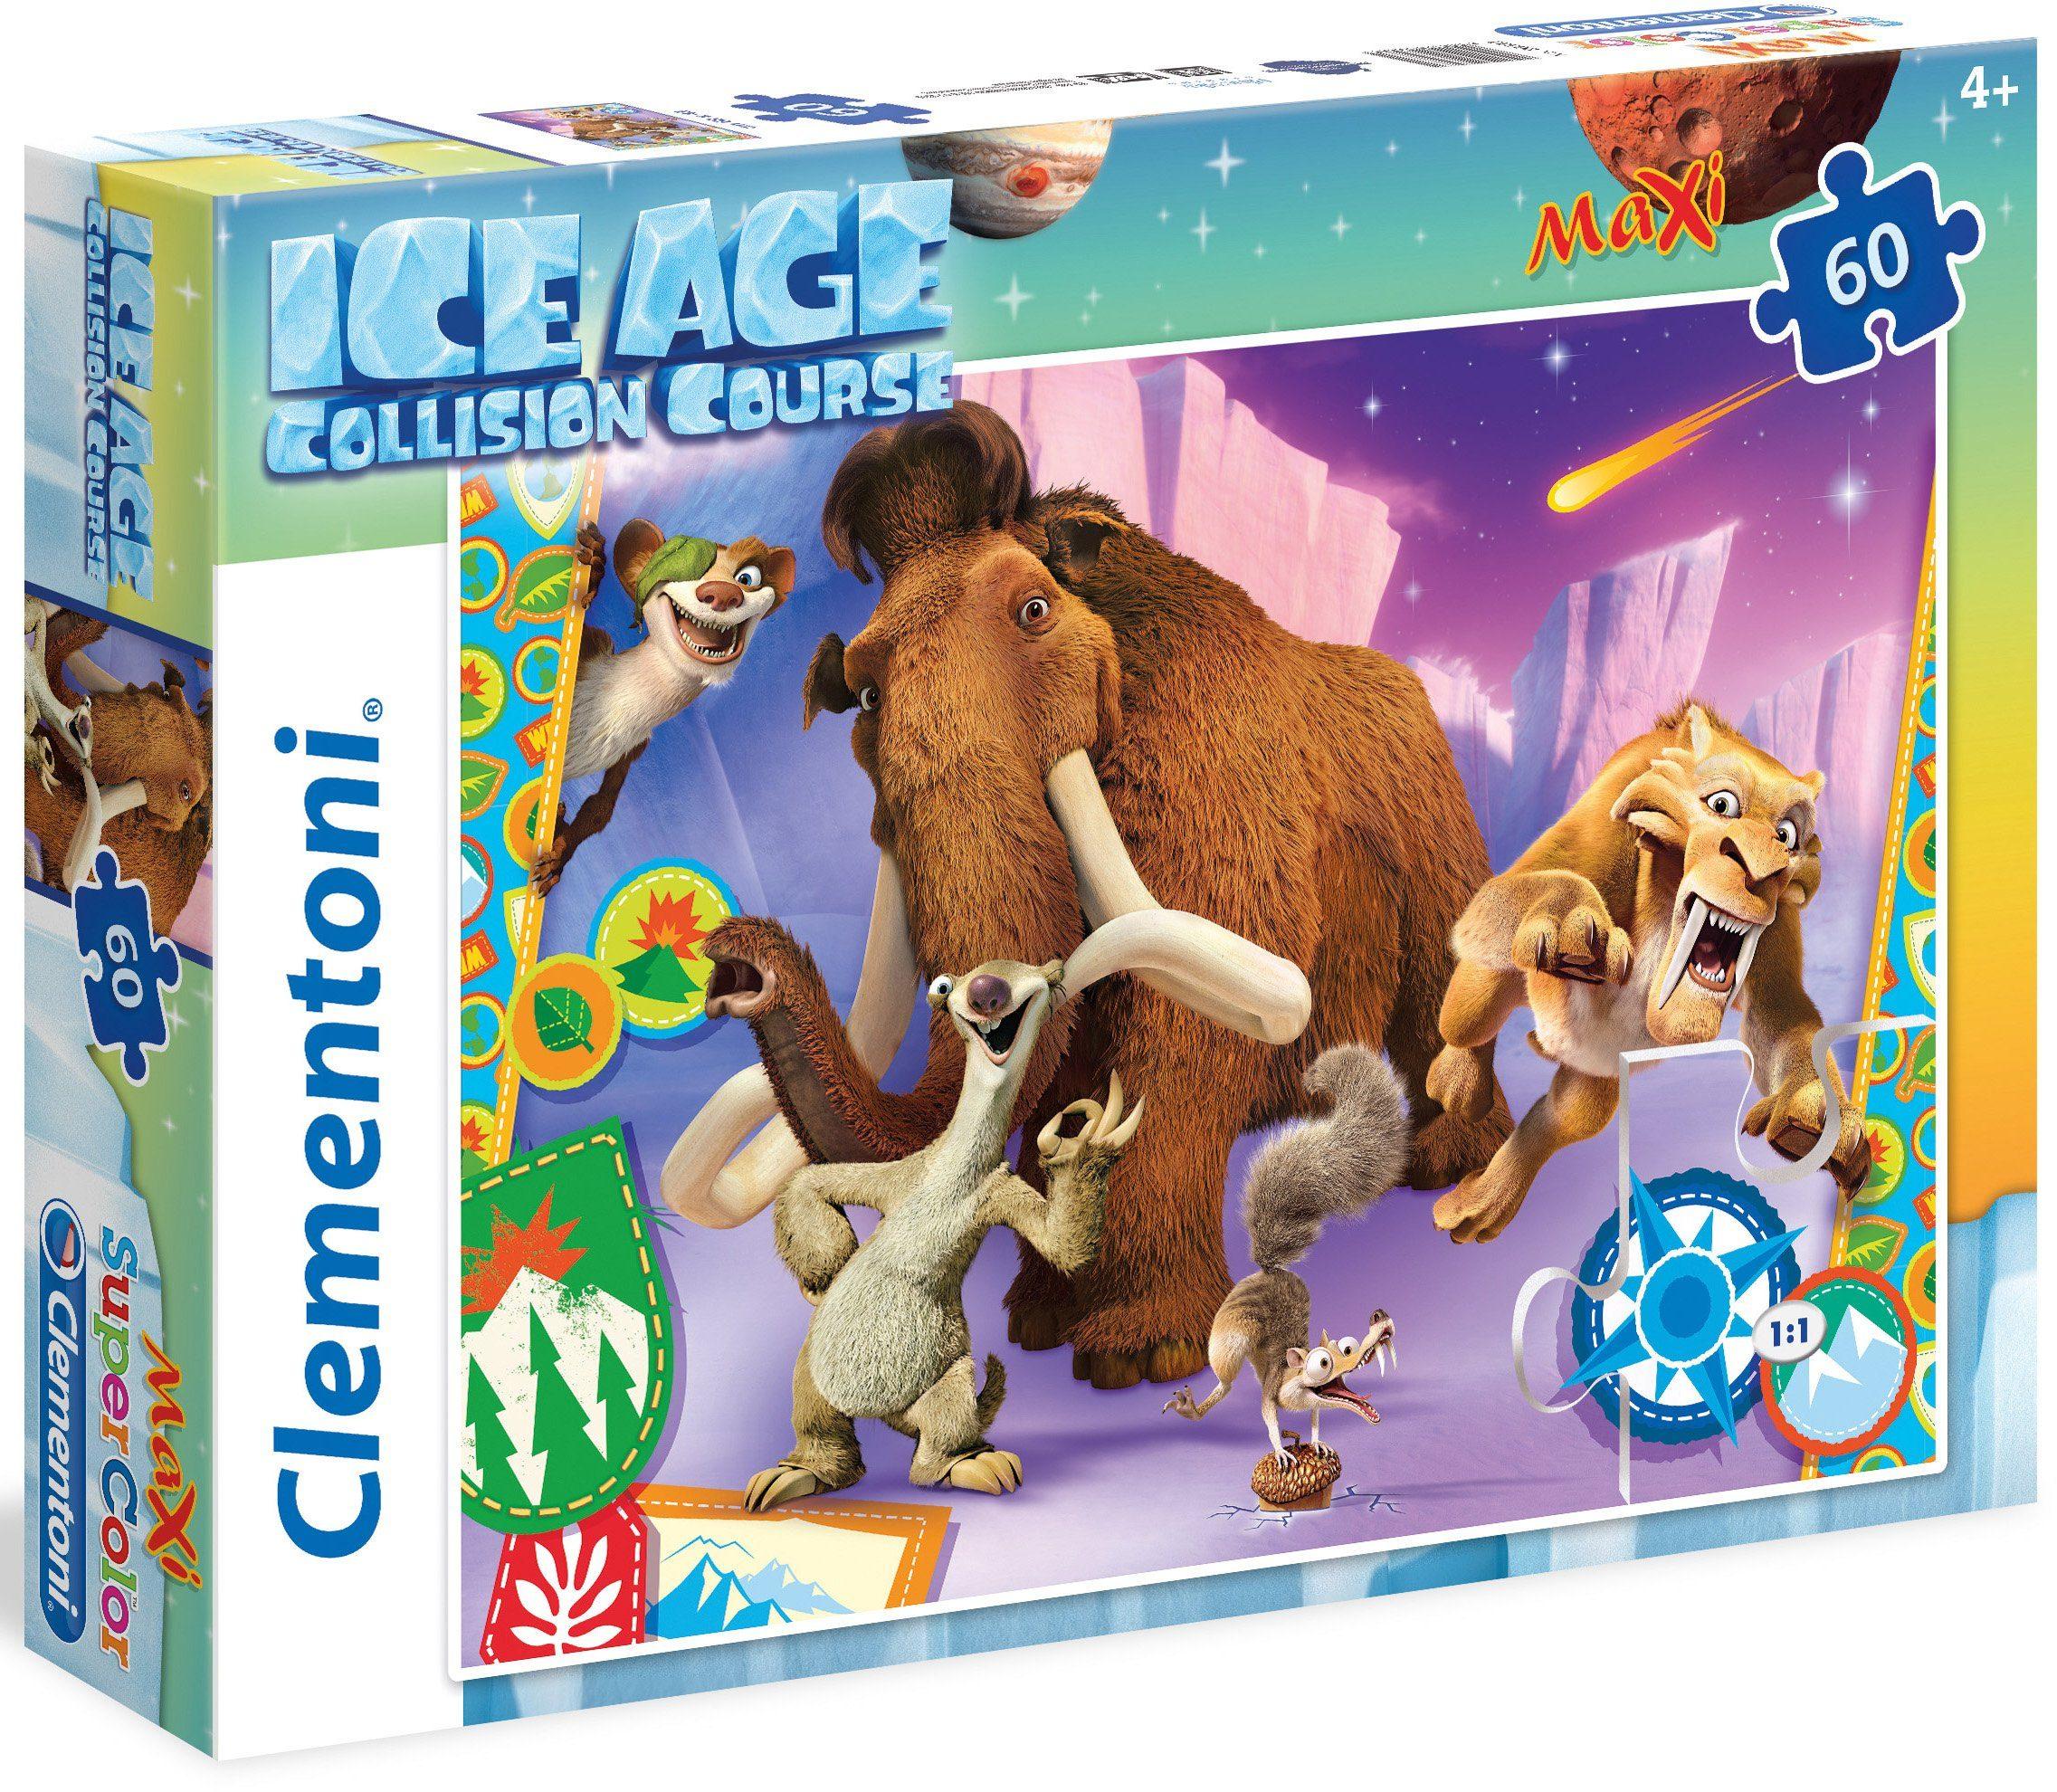 Clementoni Maxi Puzzle, 60 Teile, »Ice Age Collision Course«